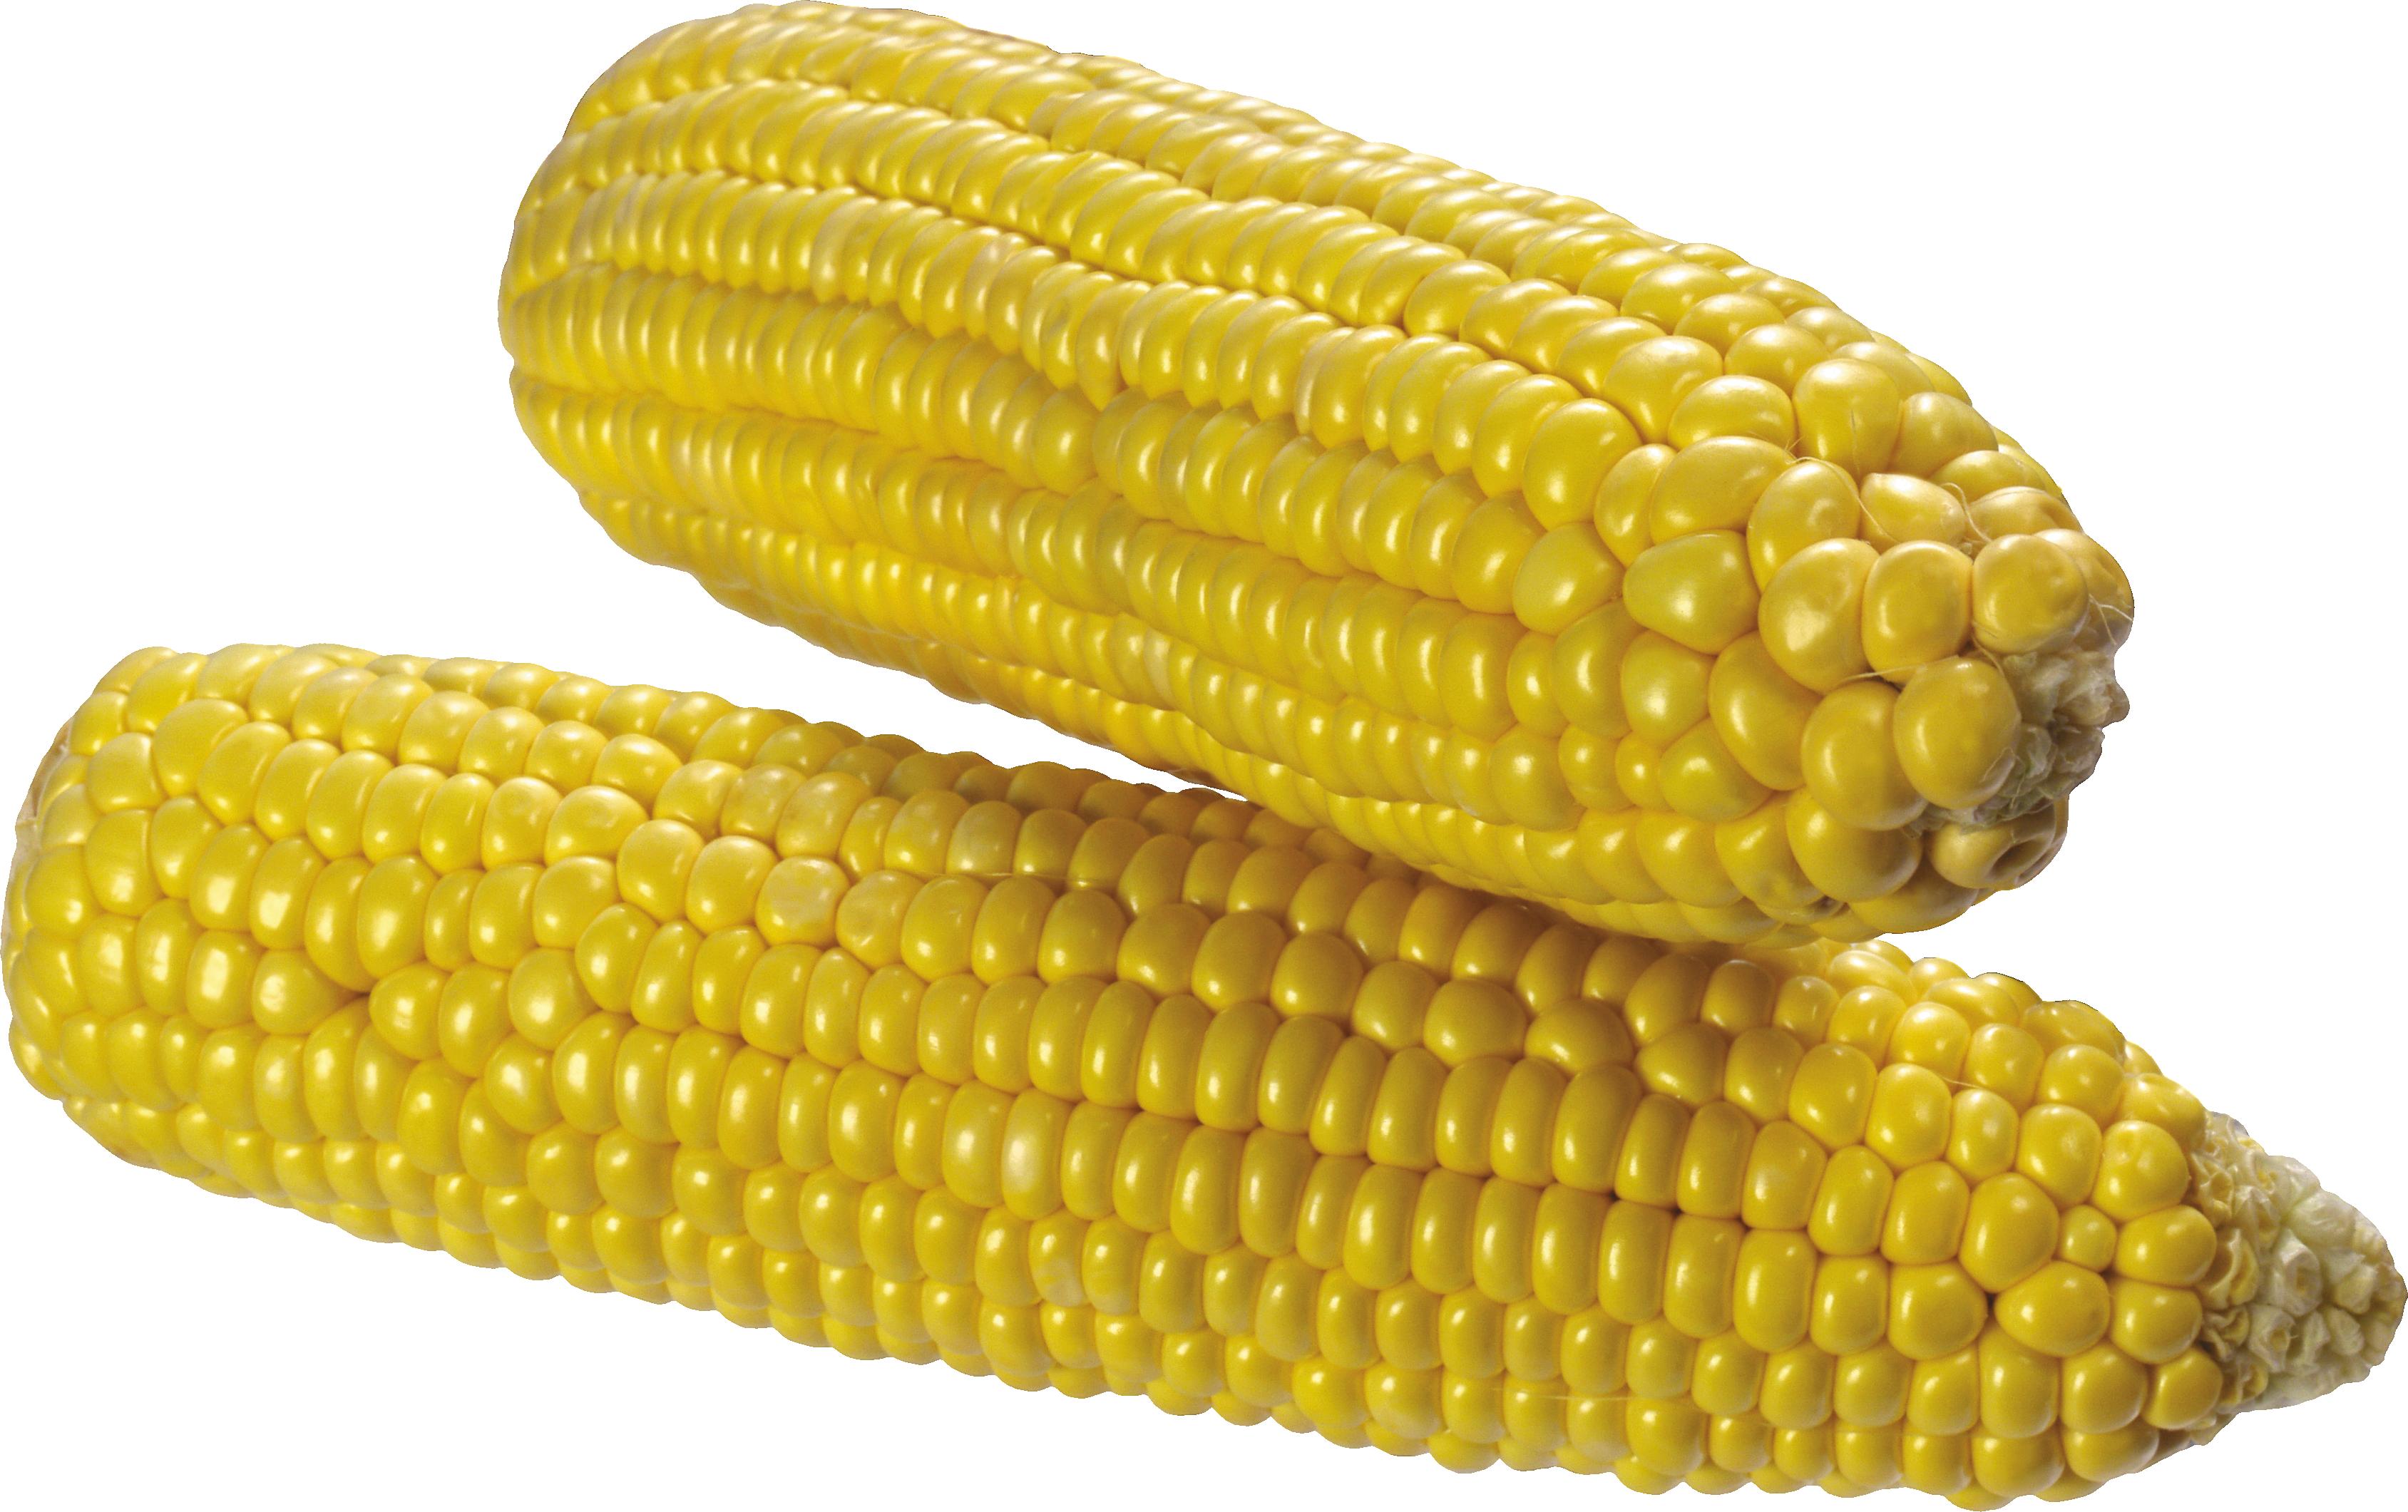 Corn PNG - 13667